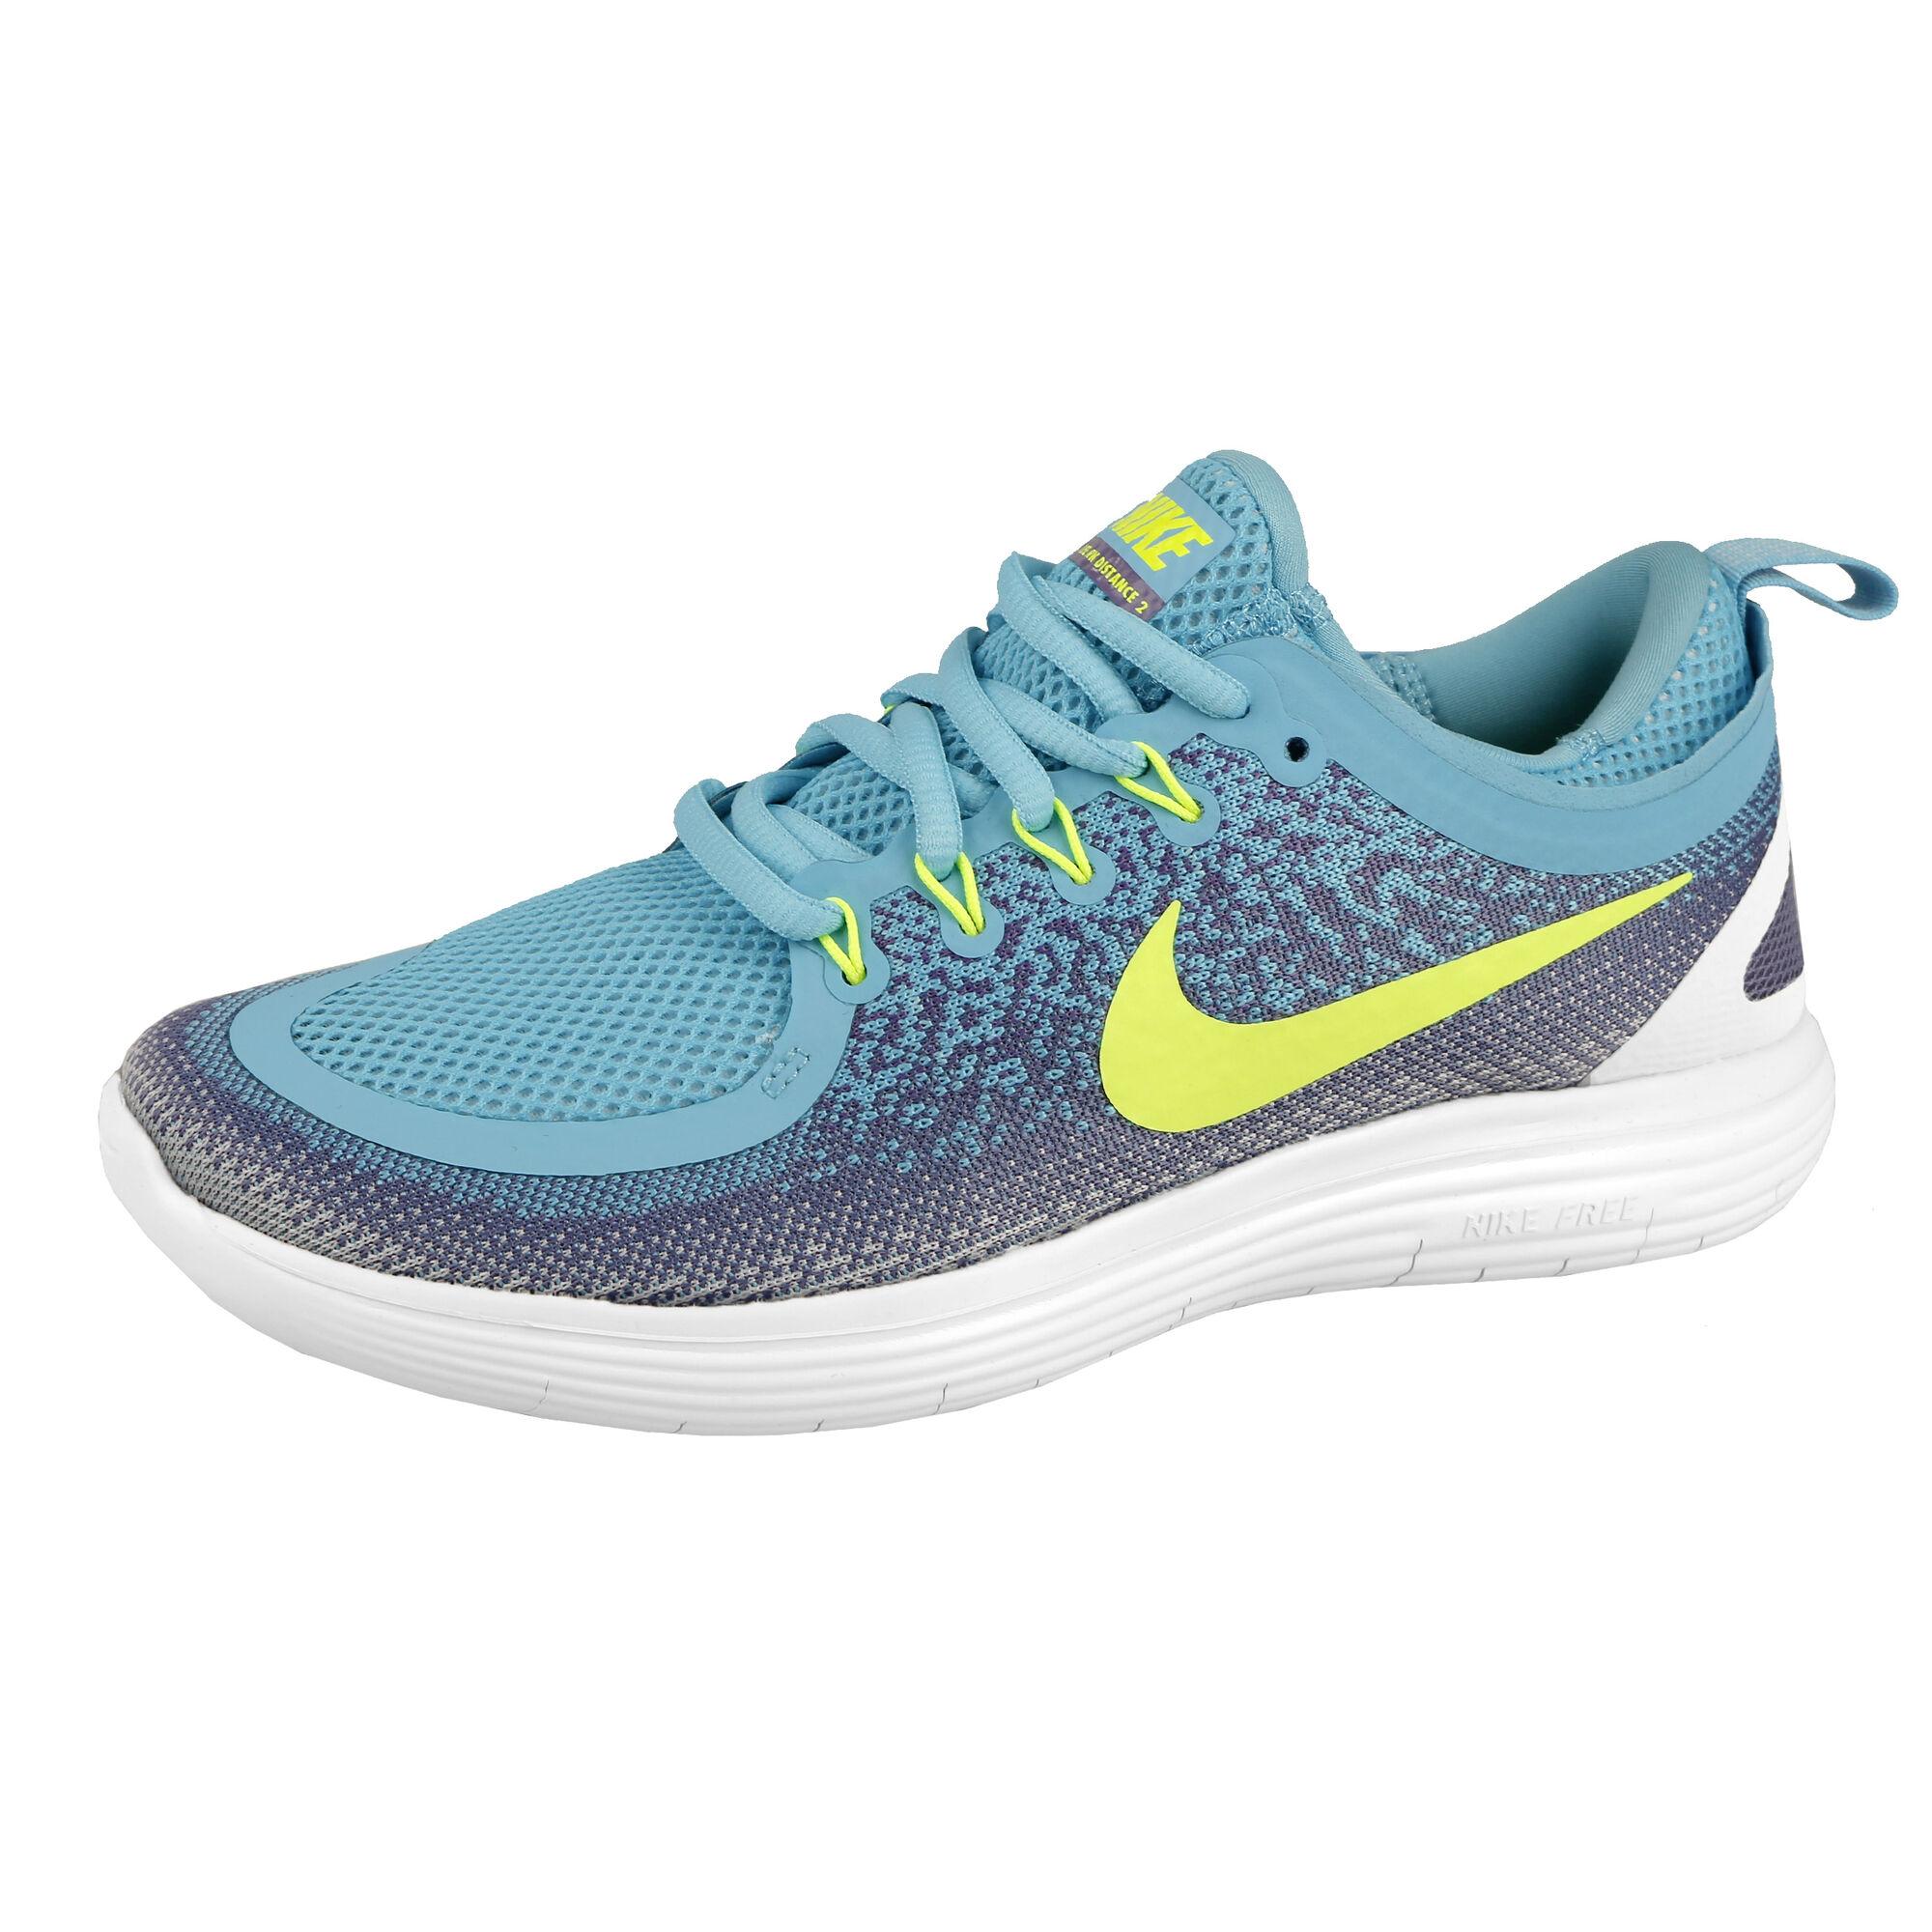 premium selection 4d4d8 80011 Nike  Nike  Nike  Nike  Nike. Nike Free RN Distance 2 ...